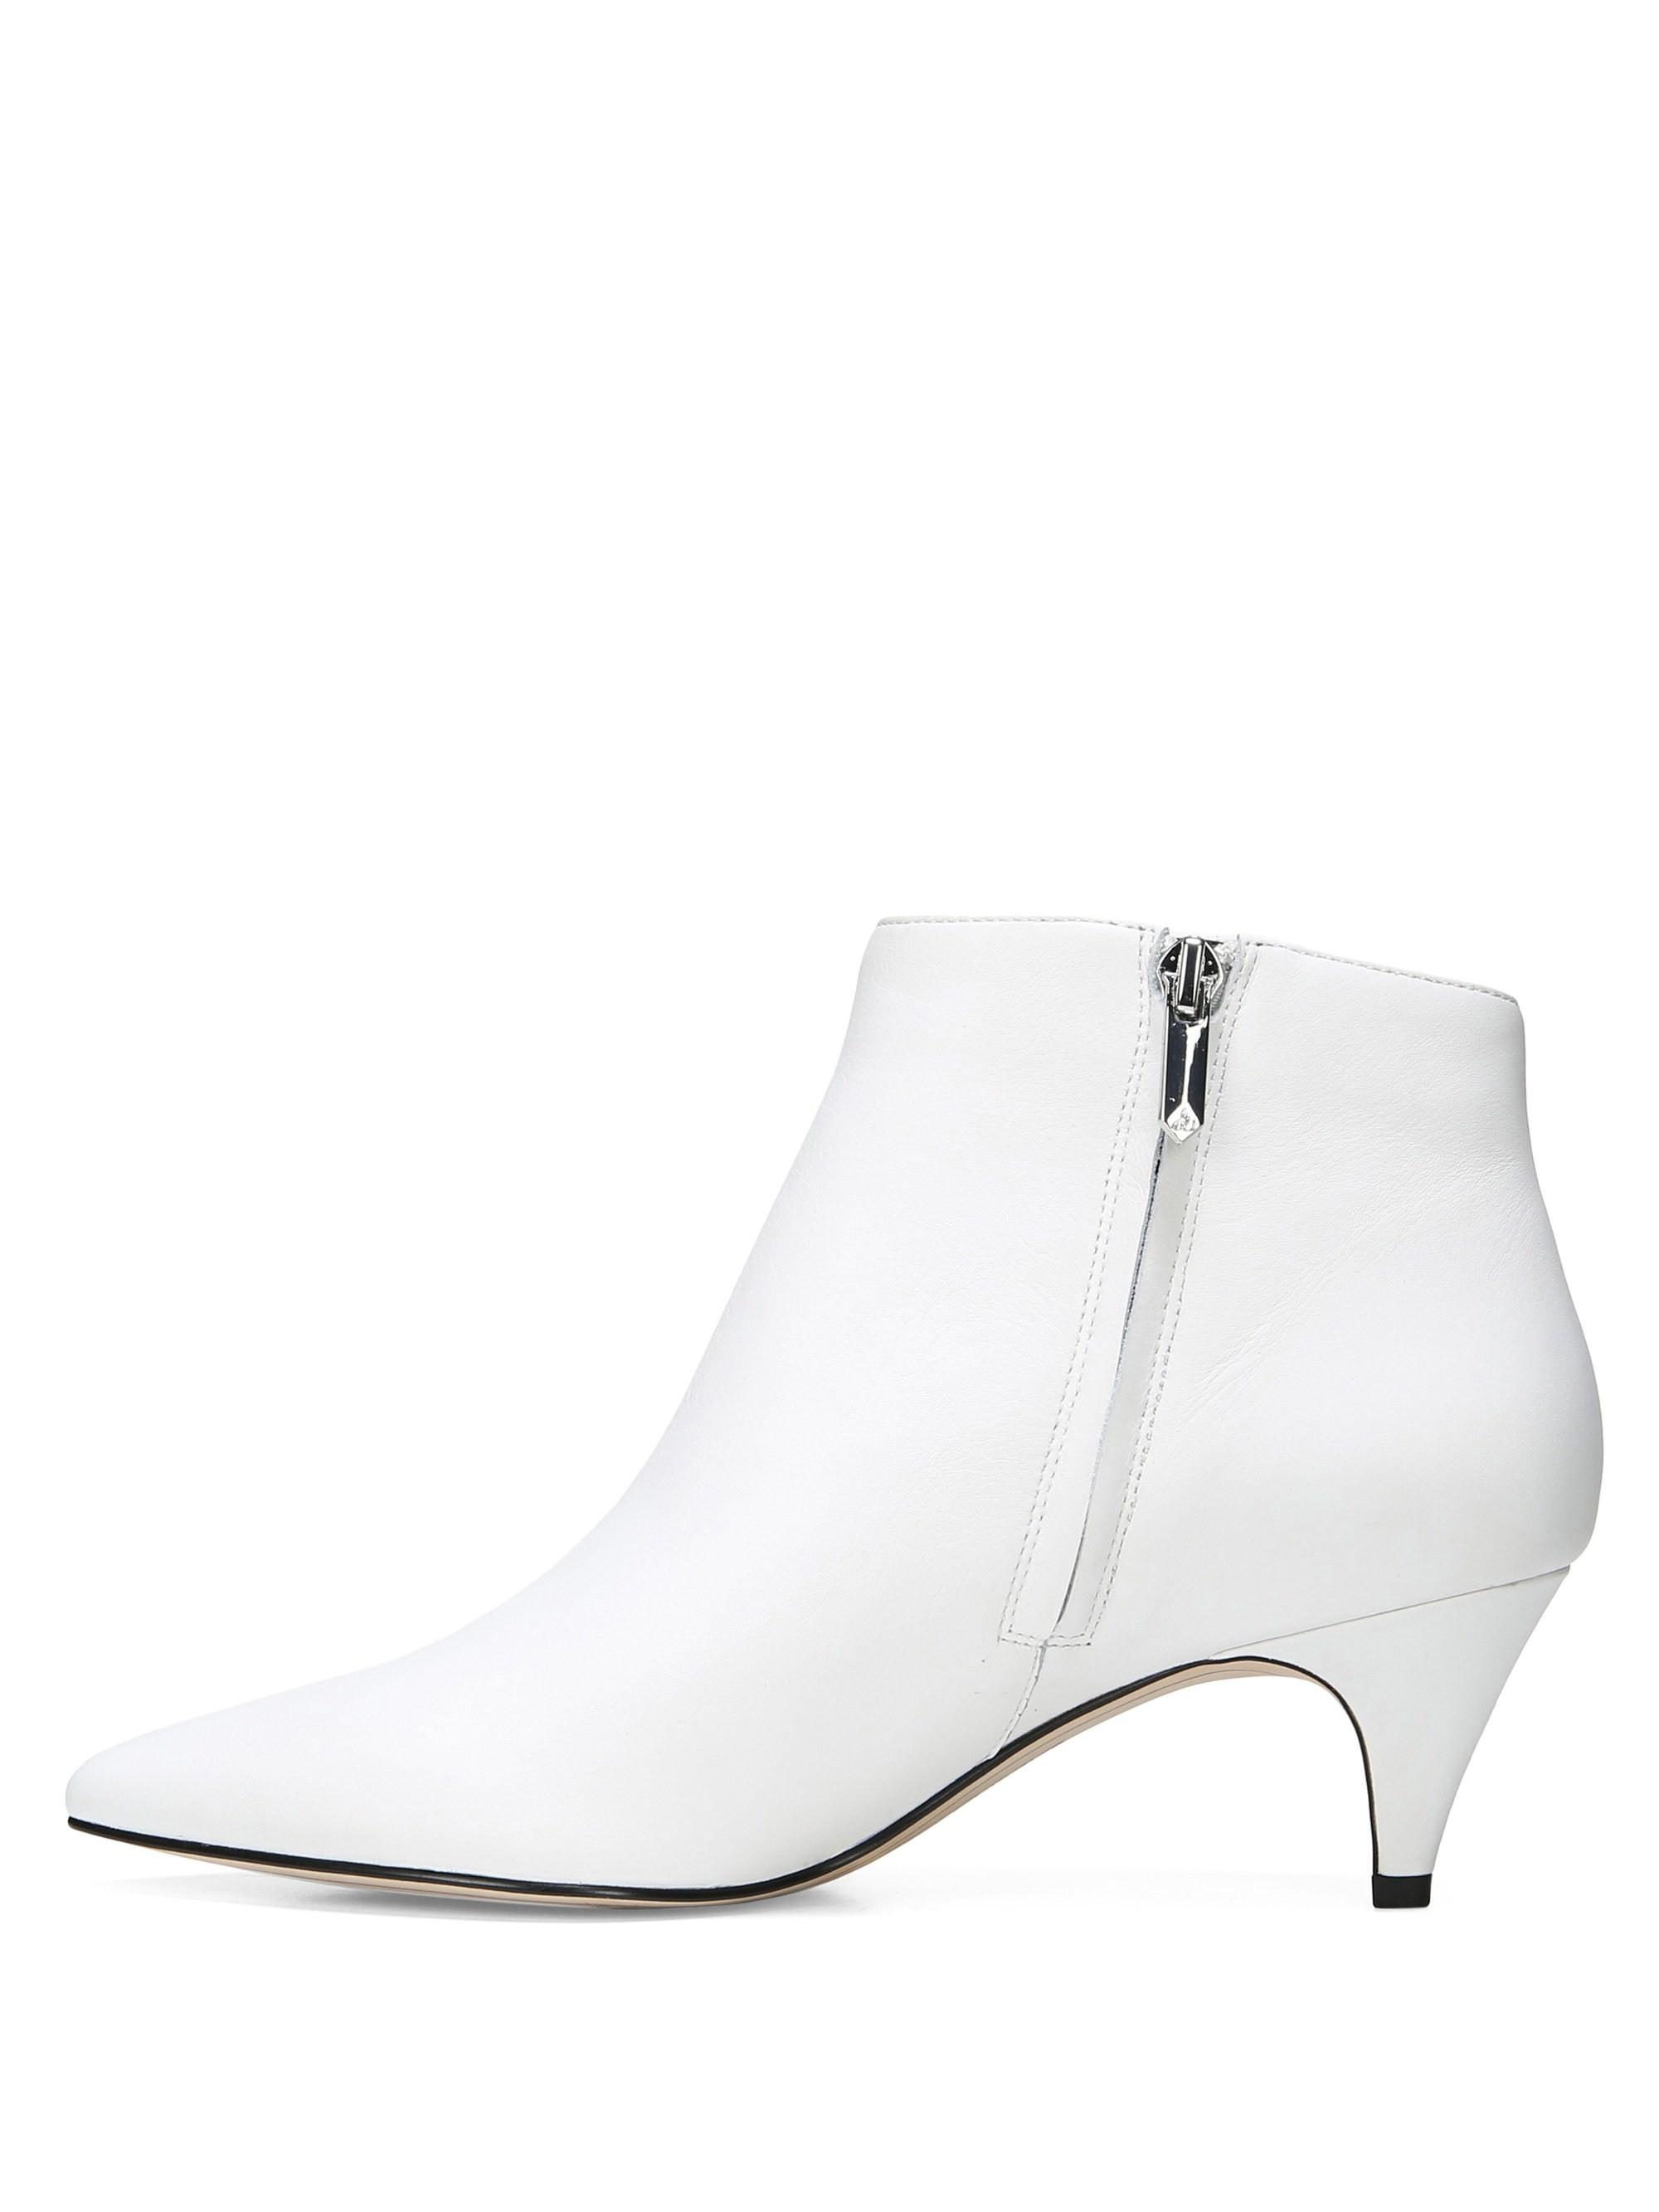 932350a0f5ca7 Sam Edelman Kinzey Leather Kitten Heel Booties - Bright White 7.5